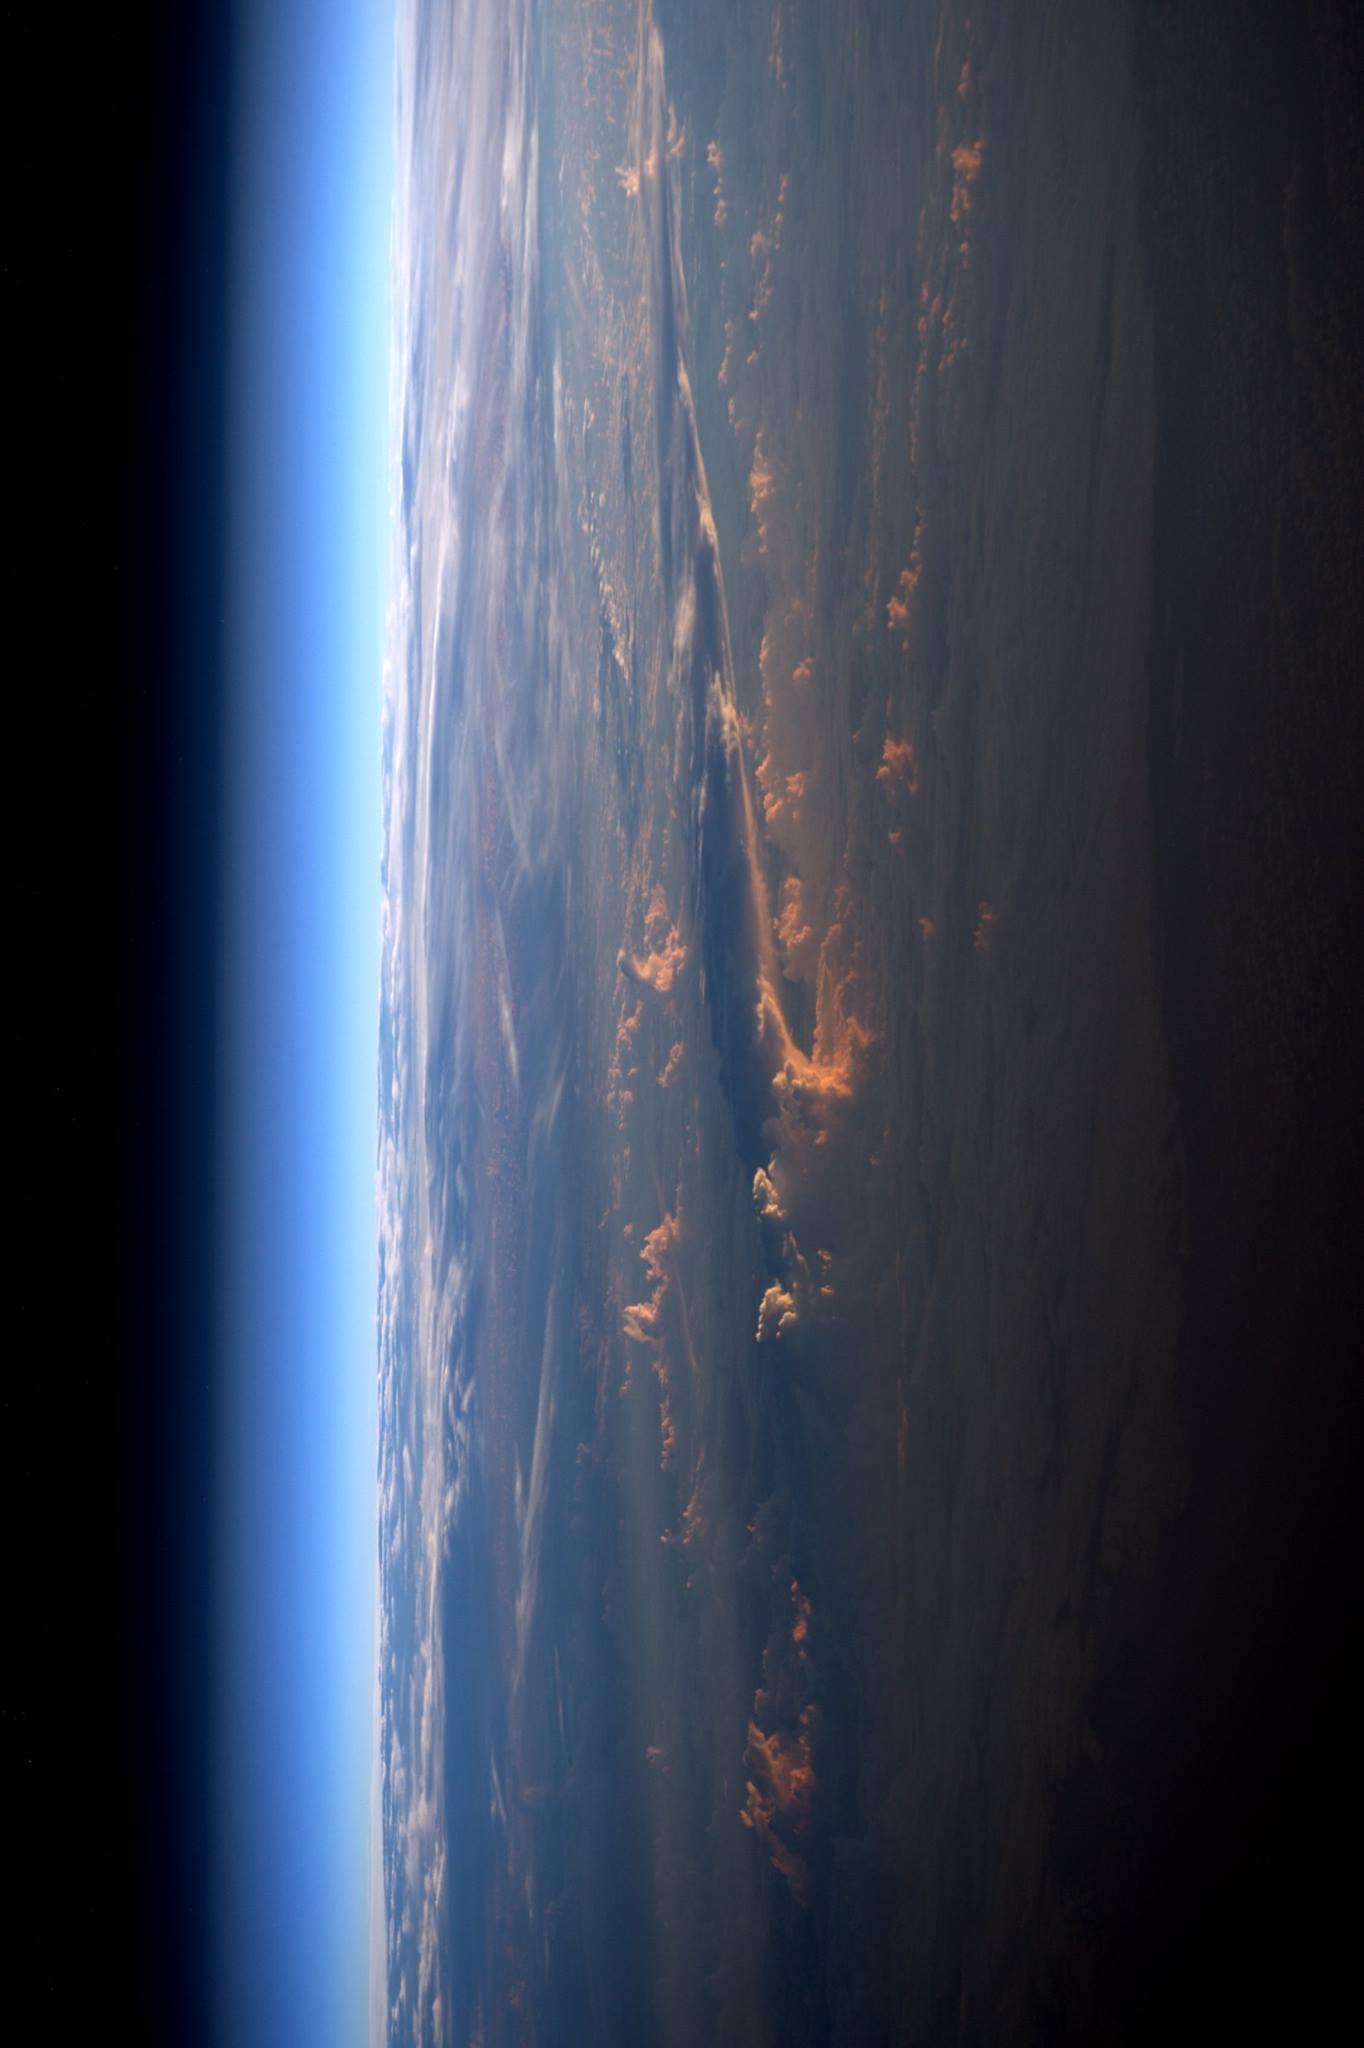 Earth Pale Blue Dot